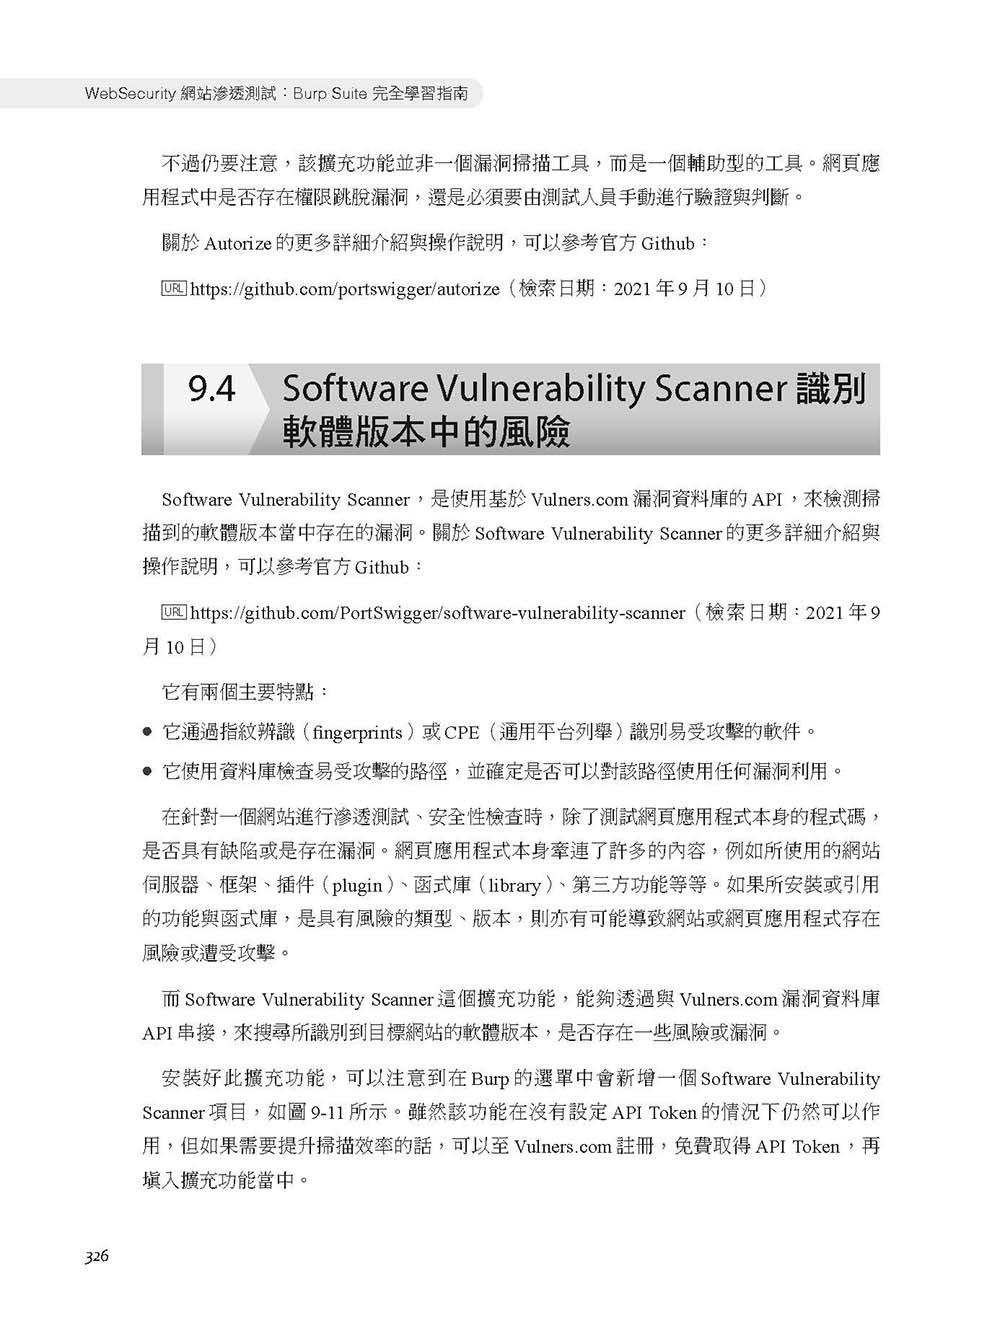 WebSecurity 網站滲透測試:Burp Suite 完全學習指南 (iT邦幫忙鐵人賽系列書)-preview-15